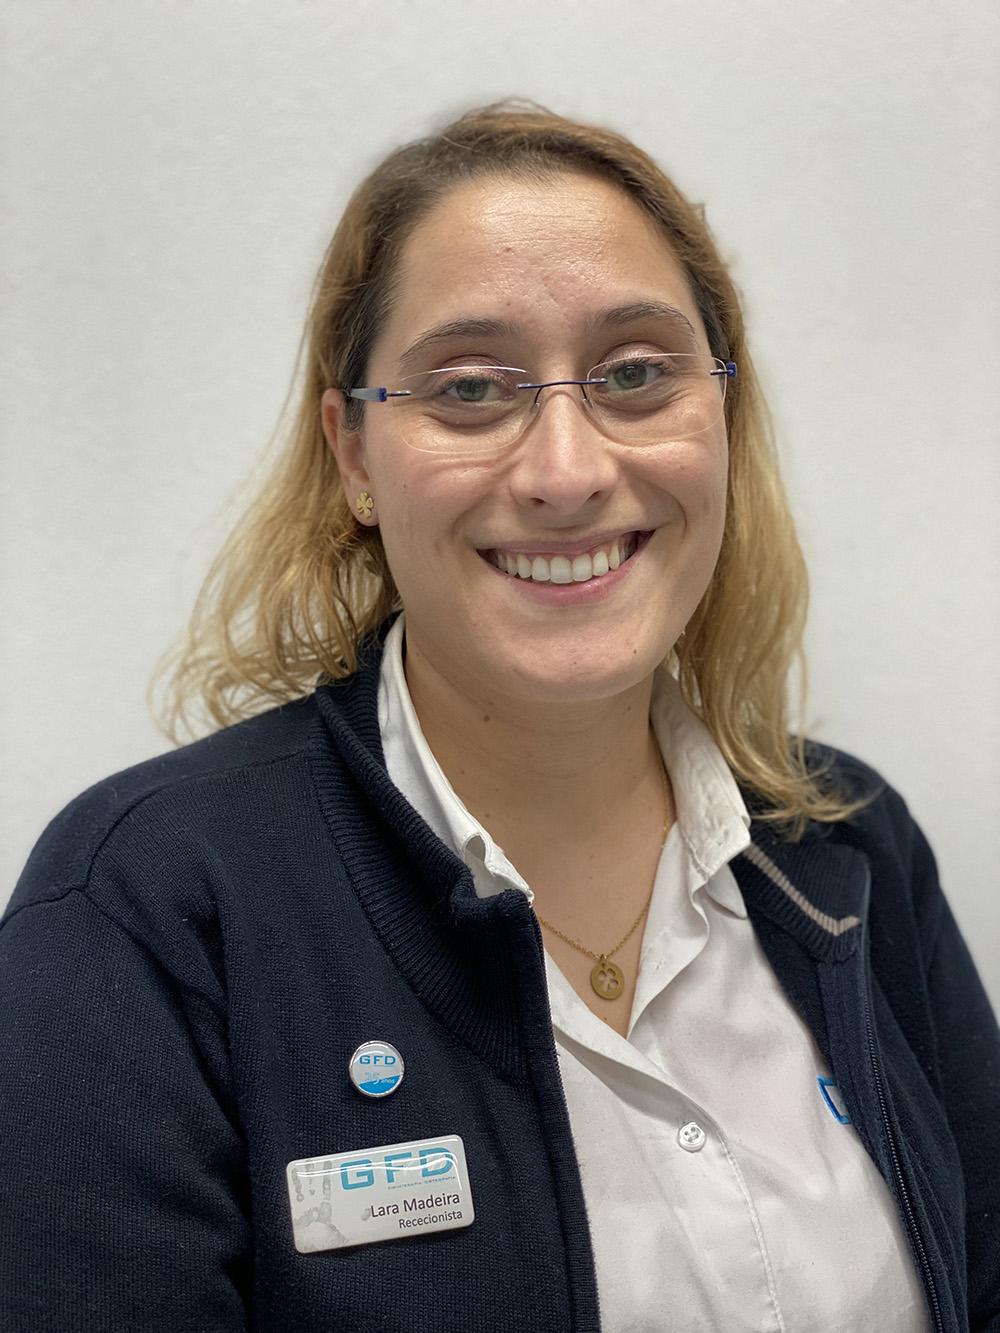 Lara Madeira